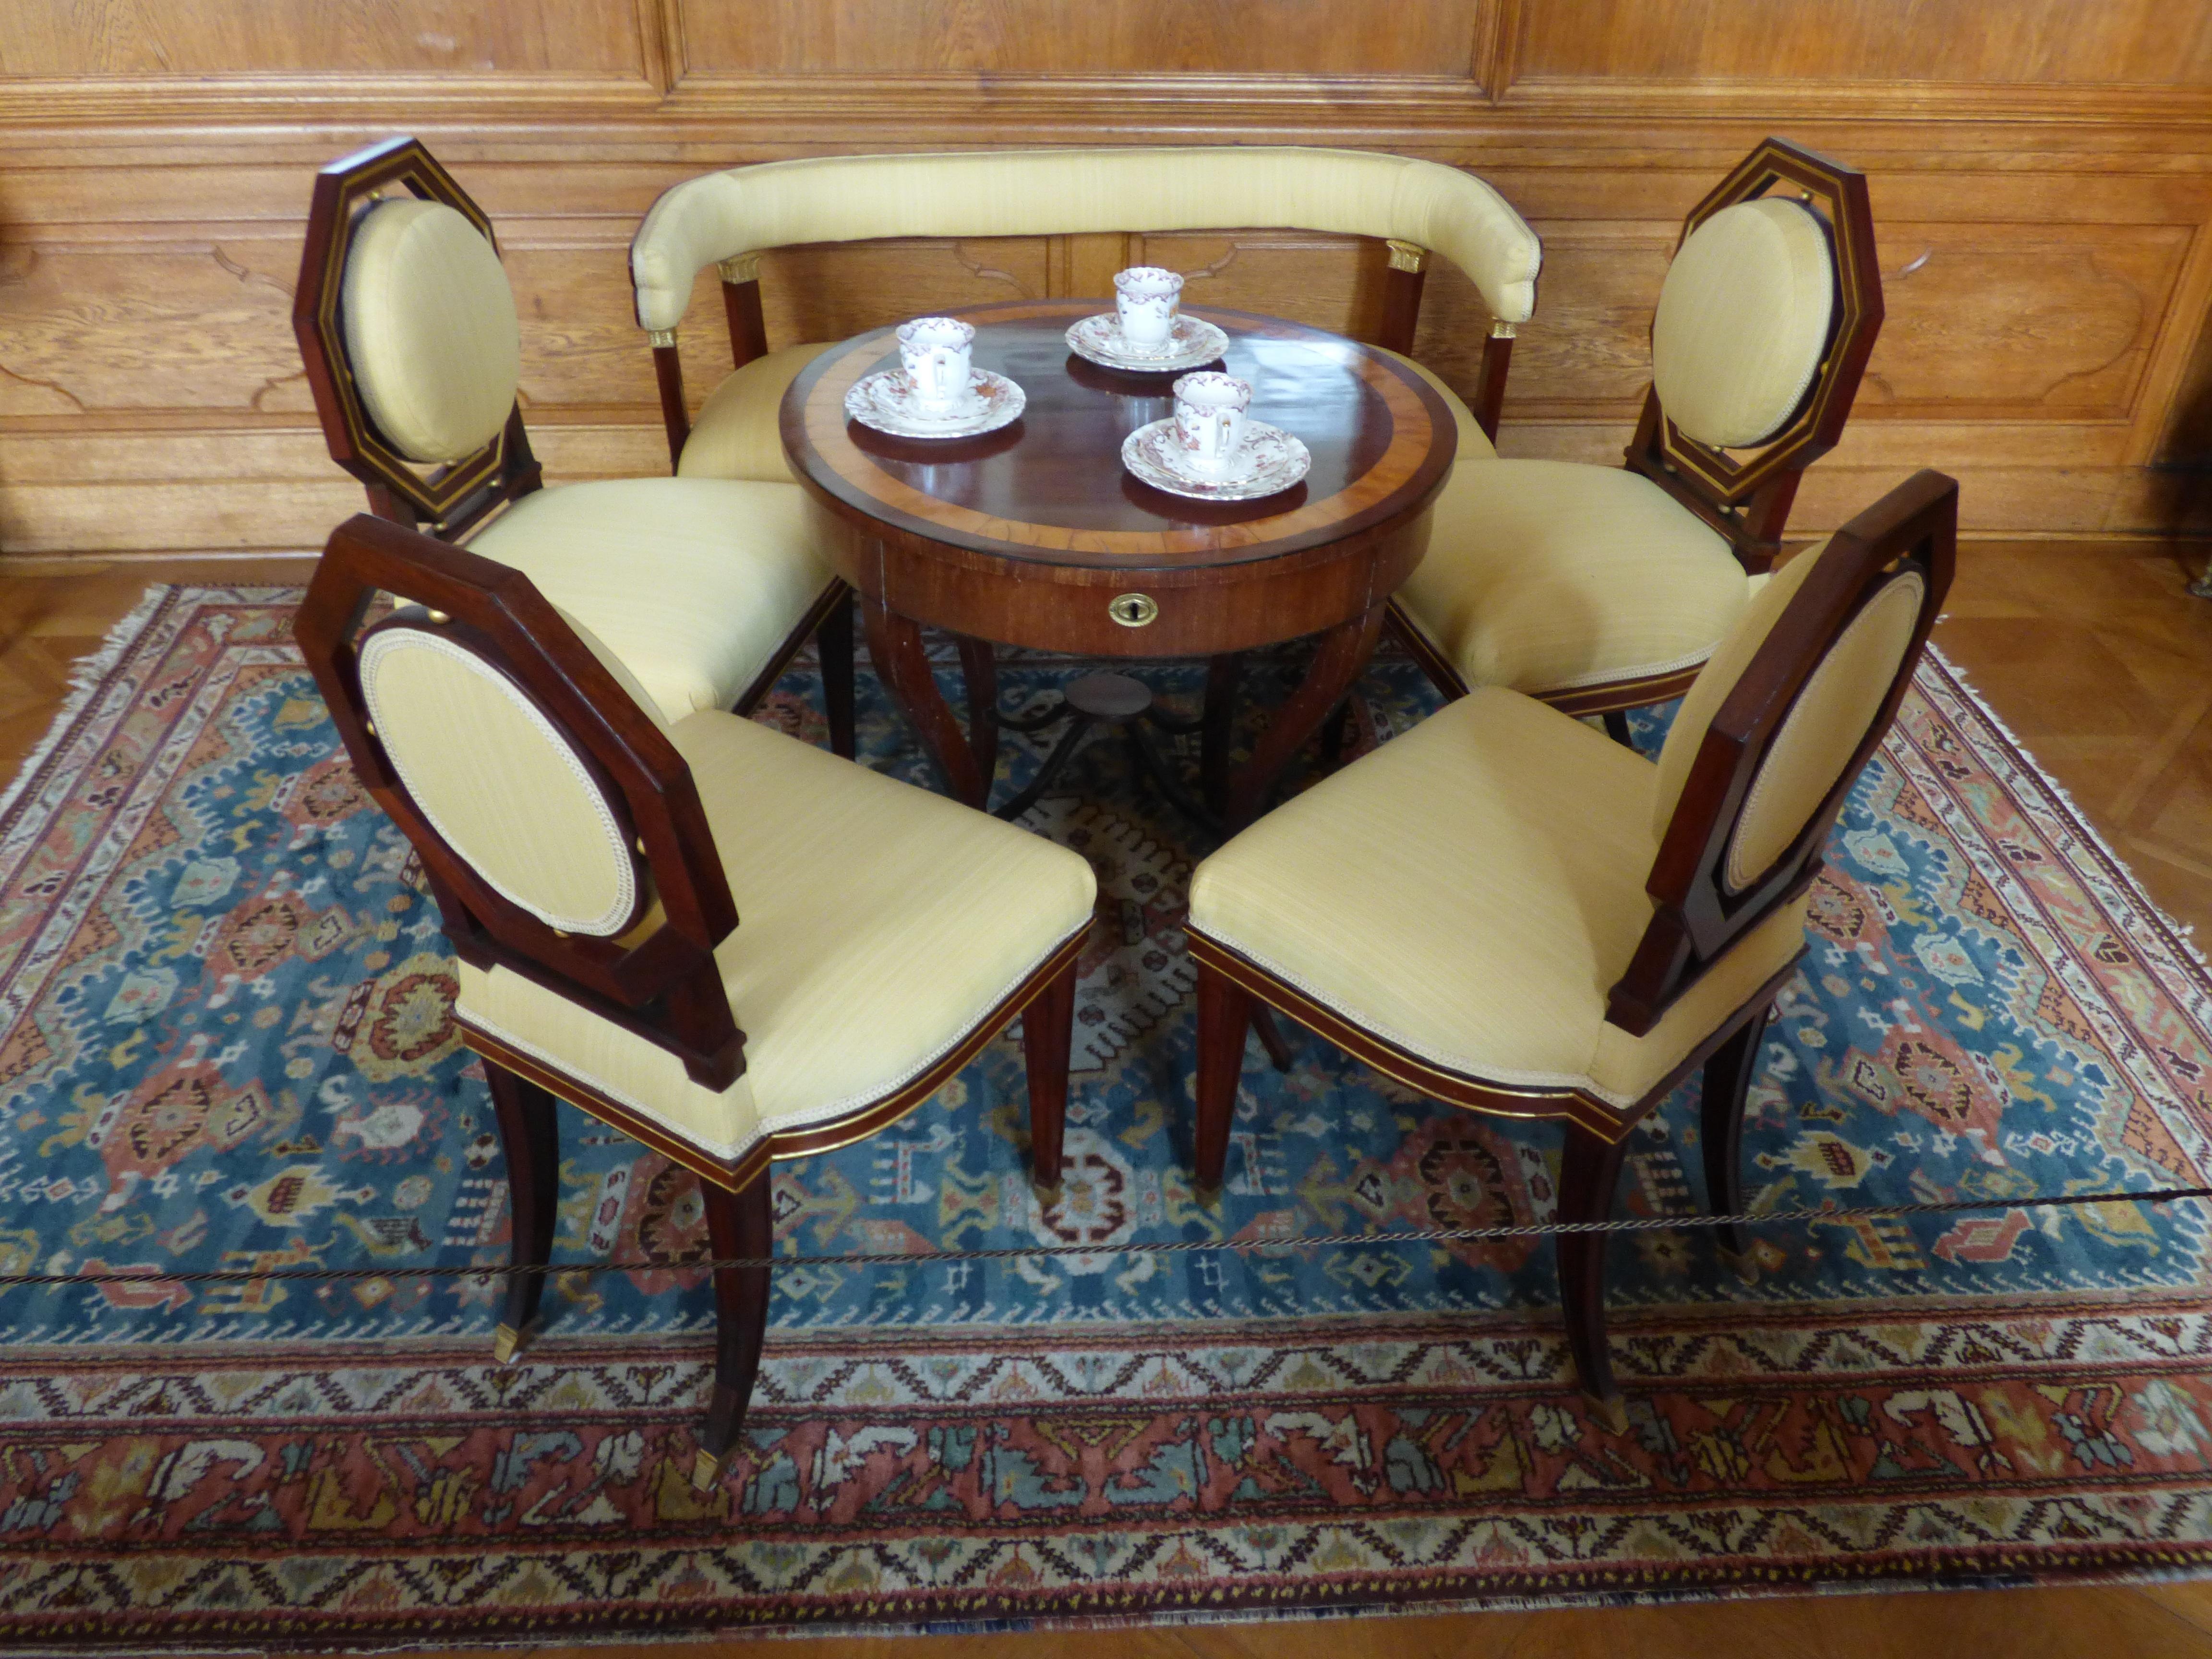 Peachy Free Images Table Cafe Coffee Wood Antique Chair Inzonedesignstudio Interior Chair Design Inzonedesignstudiocom